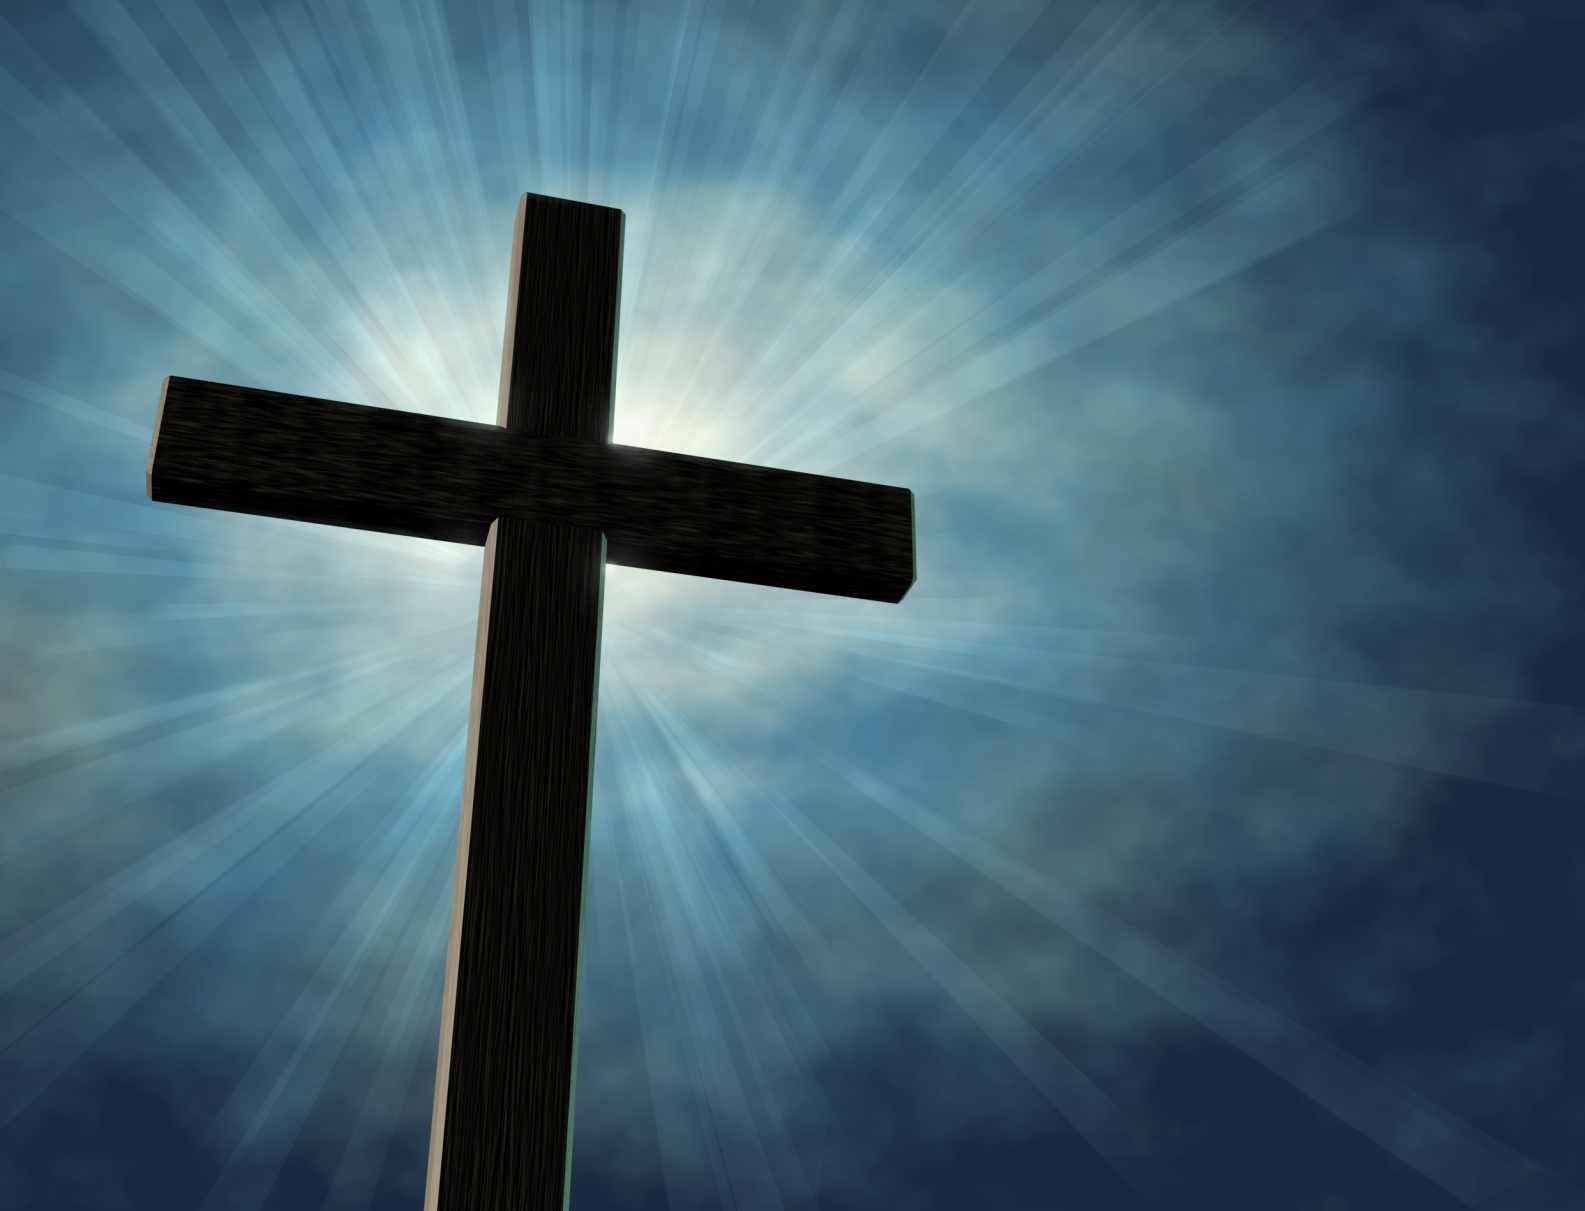 Crucified with christ lyrics